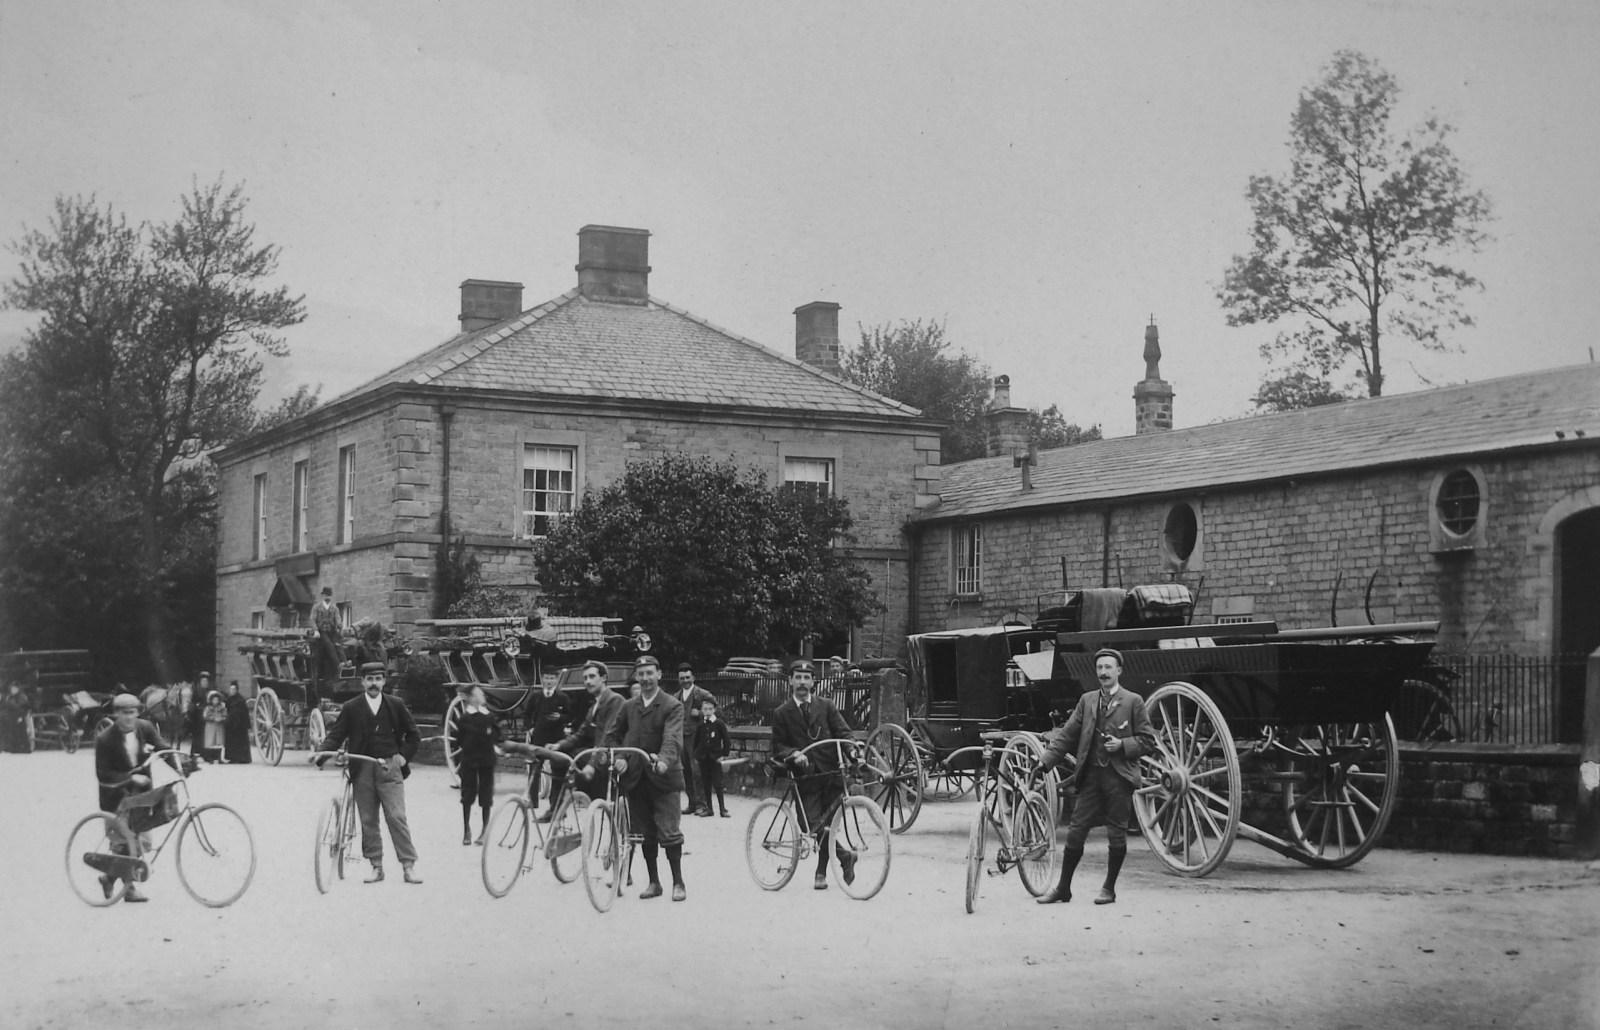 Ashopton 1890s.jpg